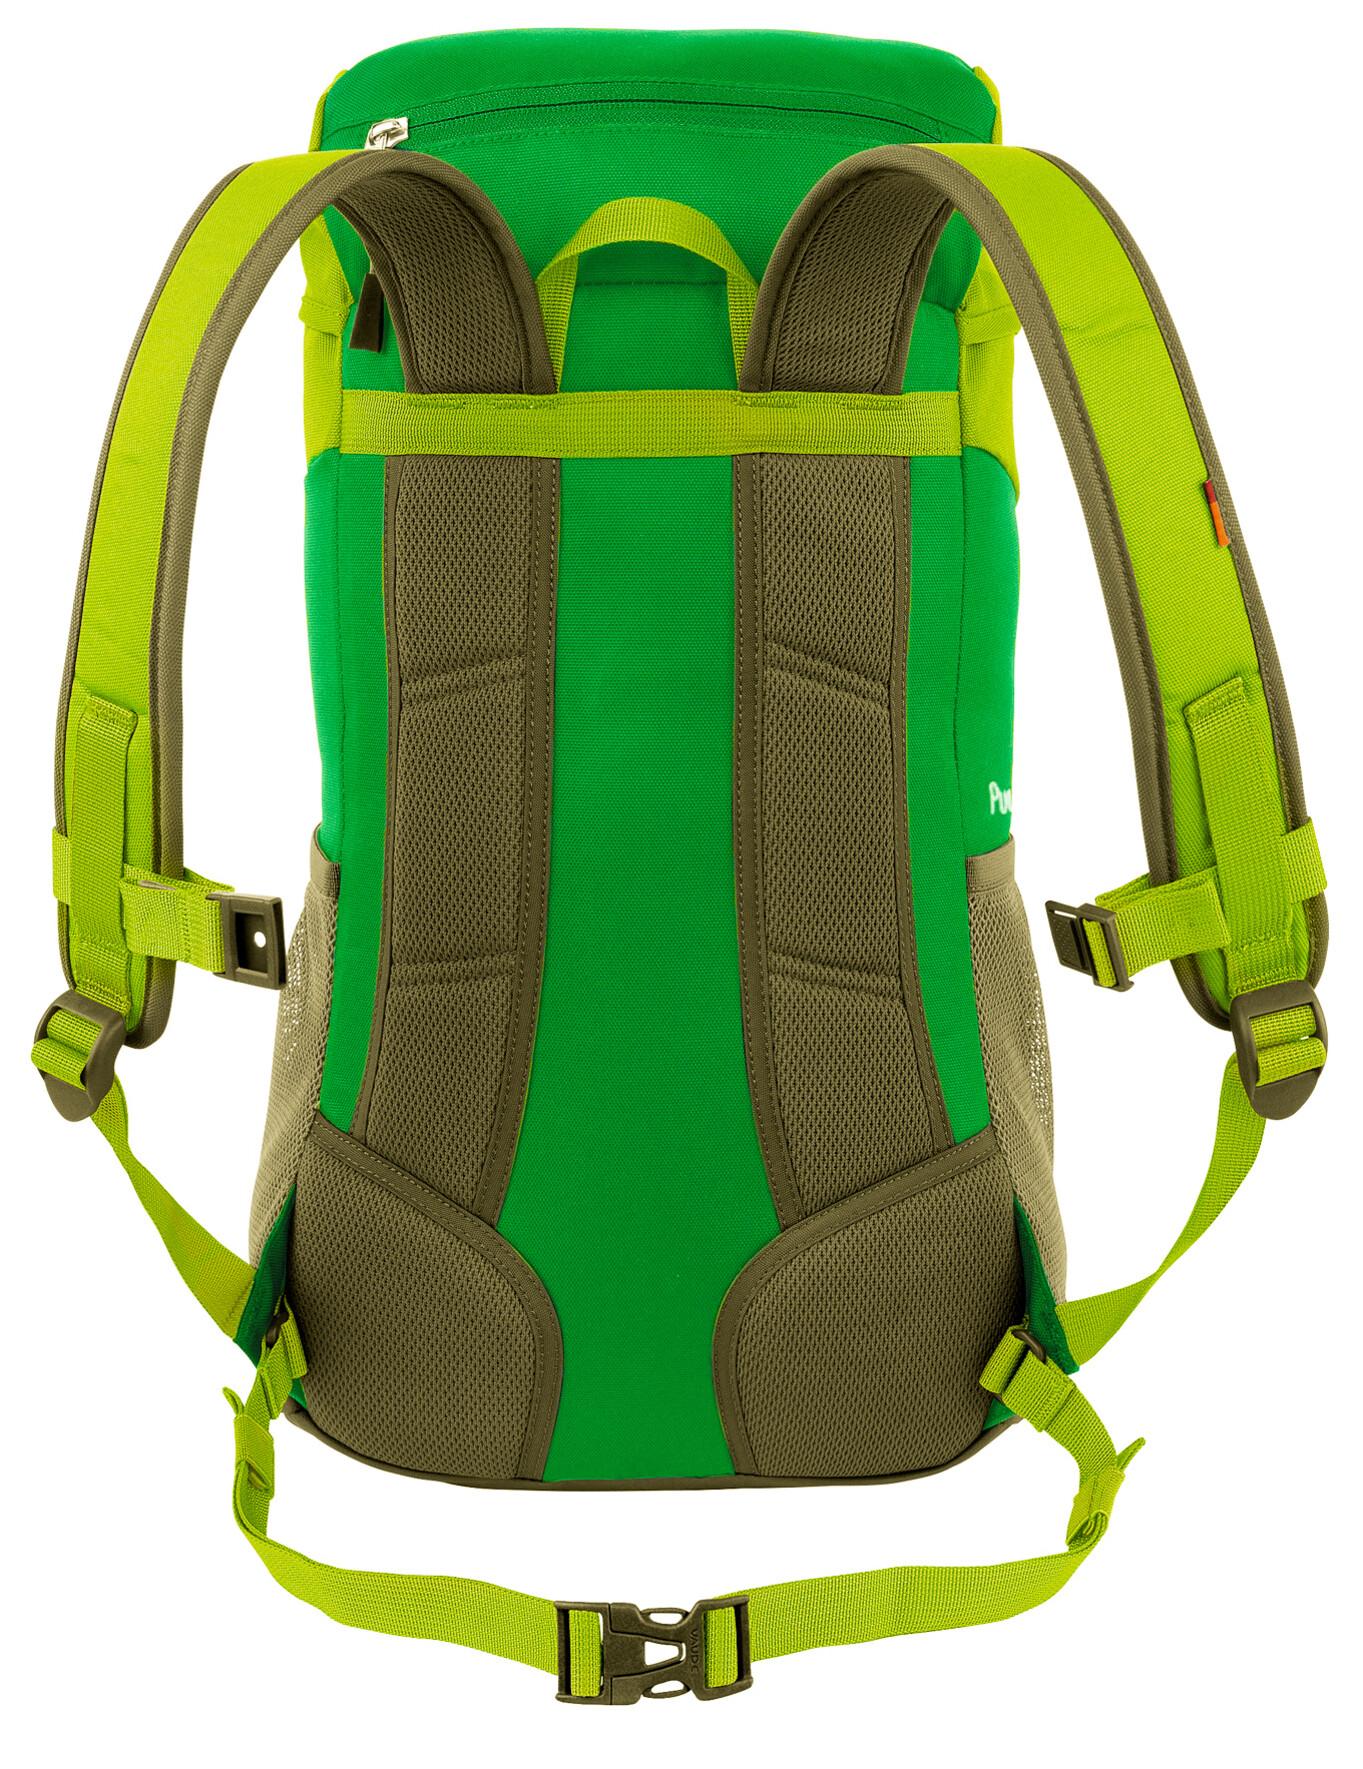 25b038f3e5c VAUDE Puck 10 rugzak Kinderen groen l Online outdoor shop Campz.nl